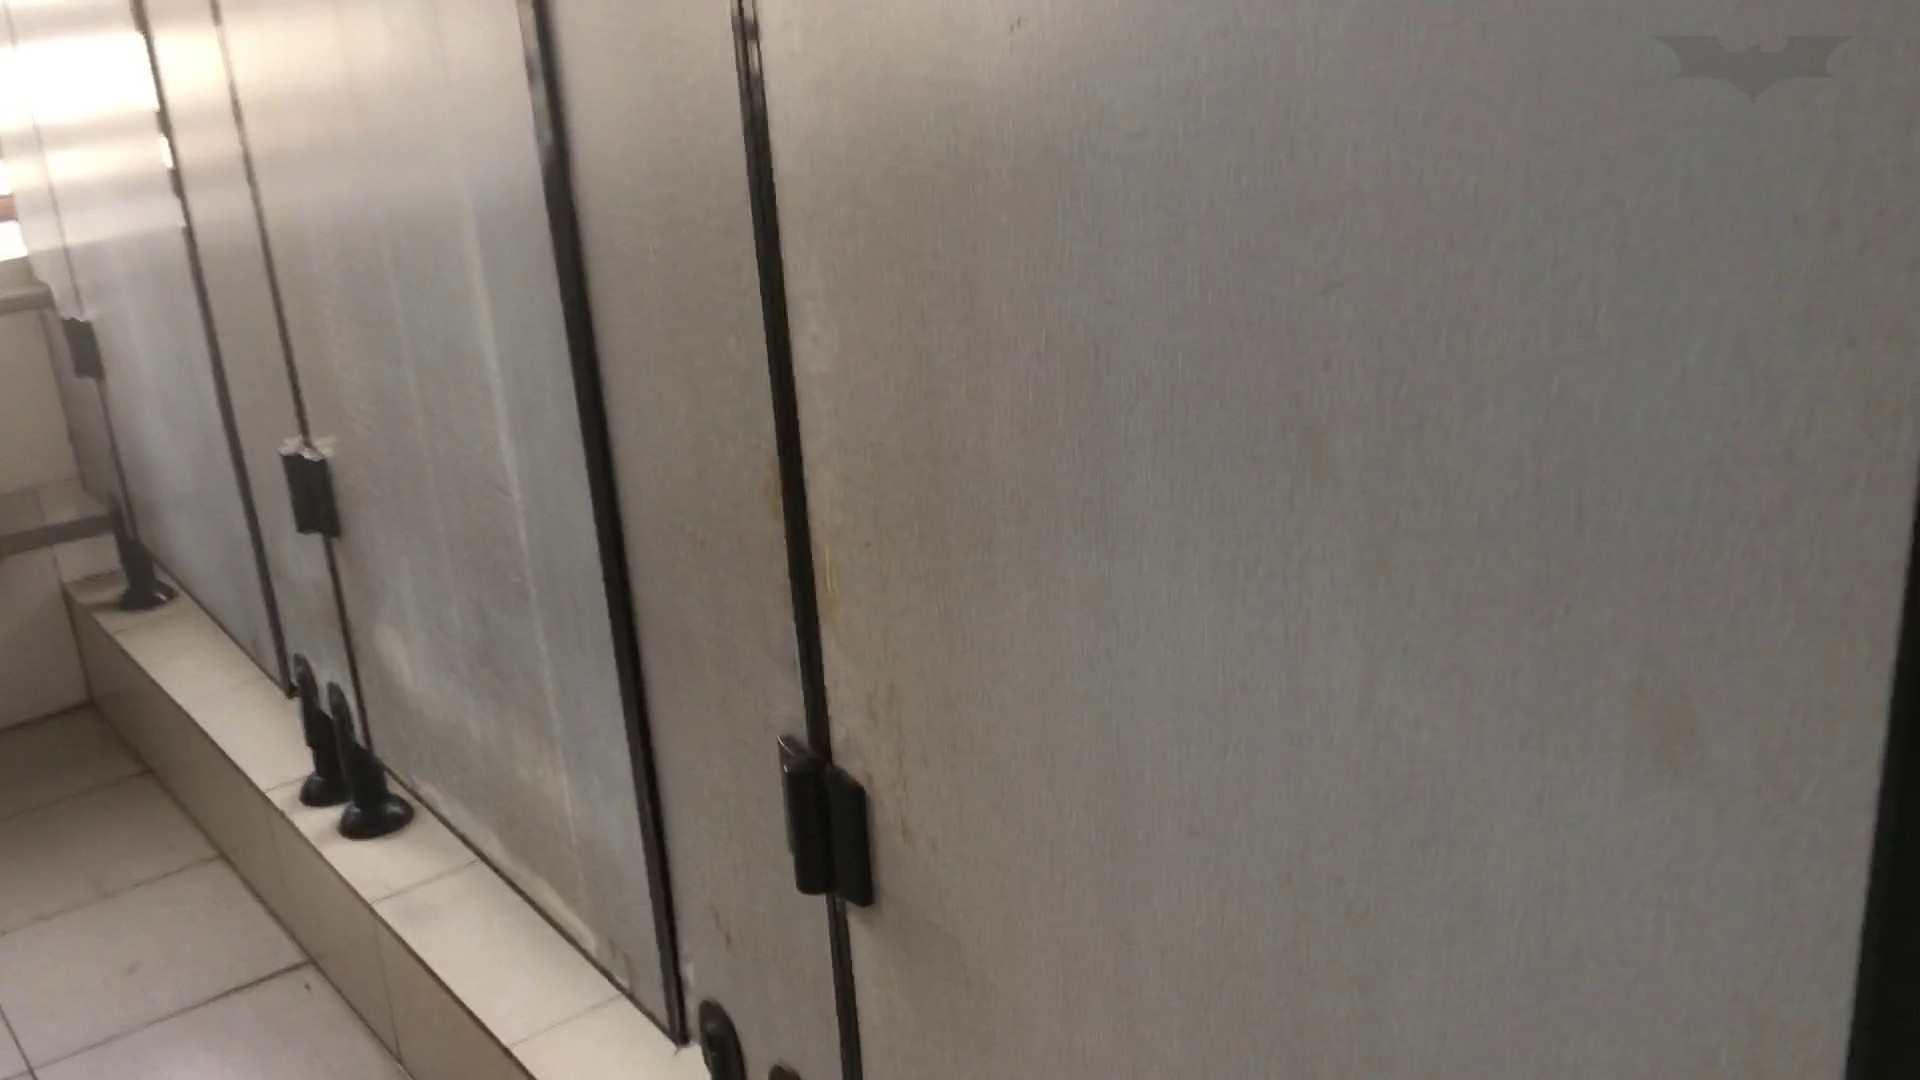 芸術大学ガチ潜入盗撮 JD盗撮 美女の洗面所の秘密 Vol.90 美肌 エロ画像 35画像 29